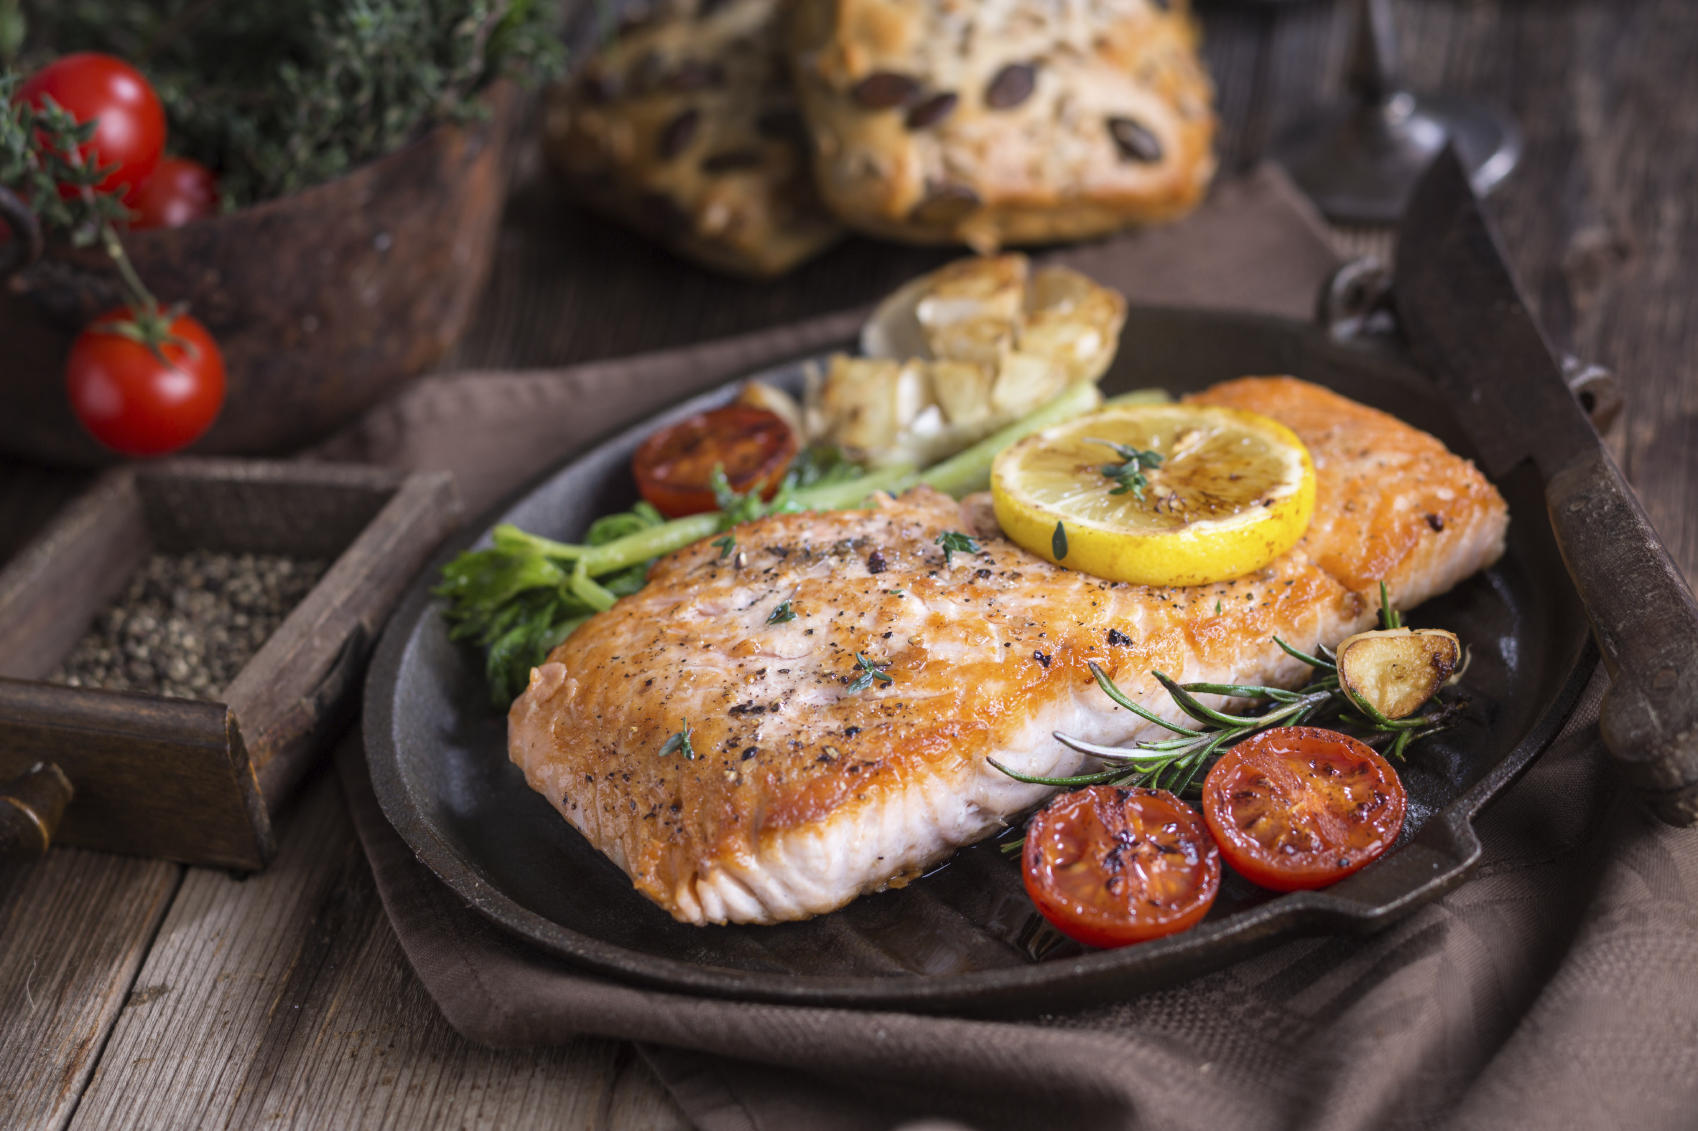 eat fish every week